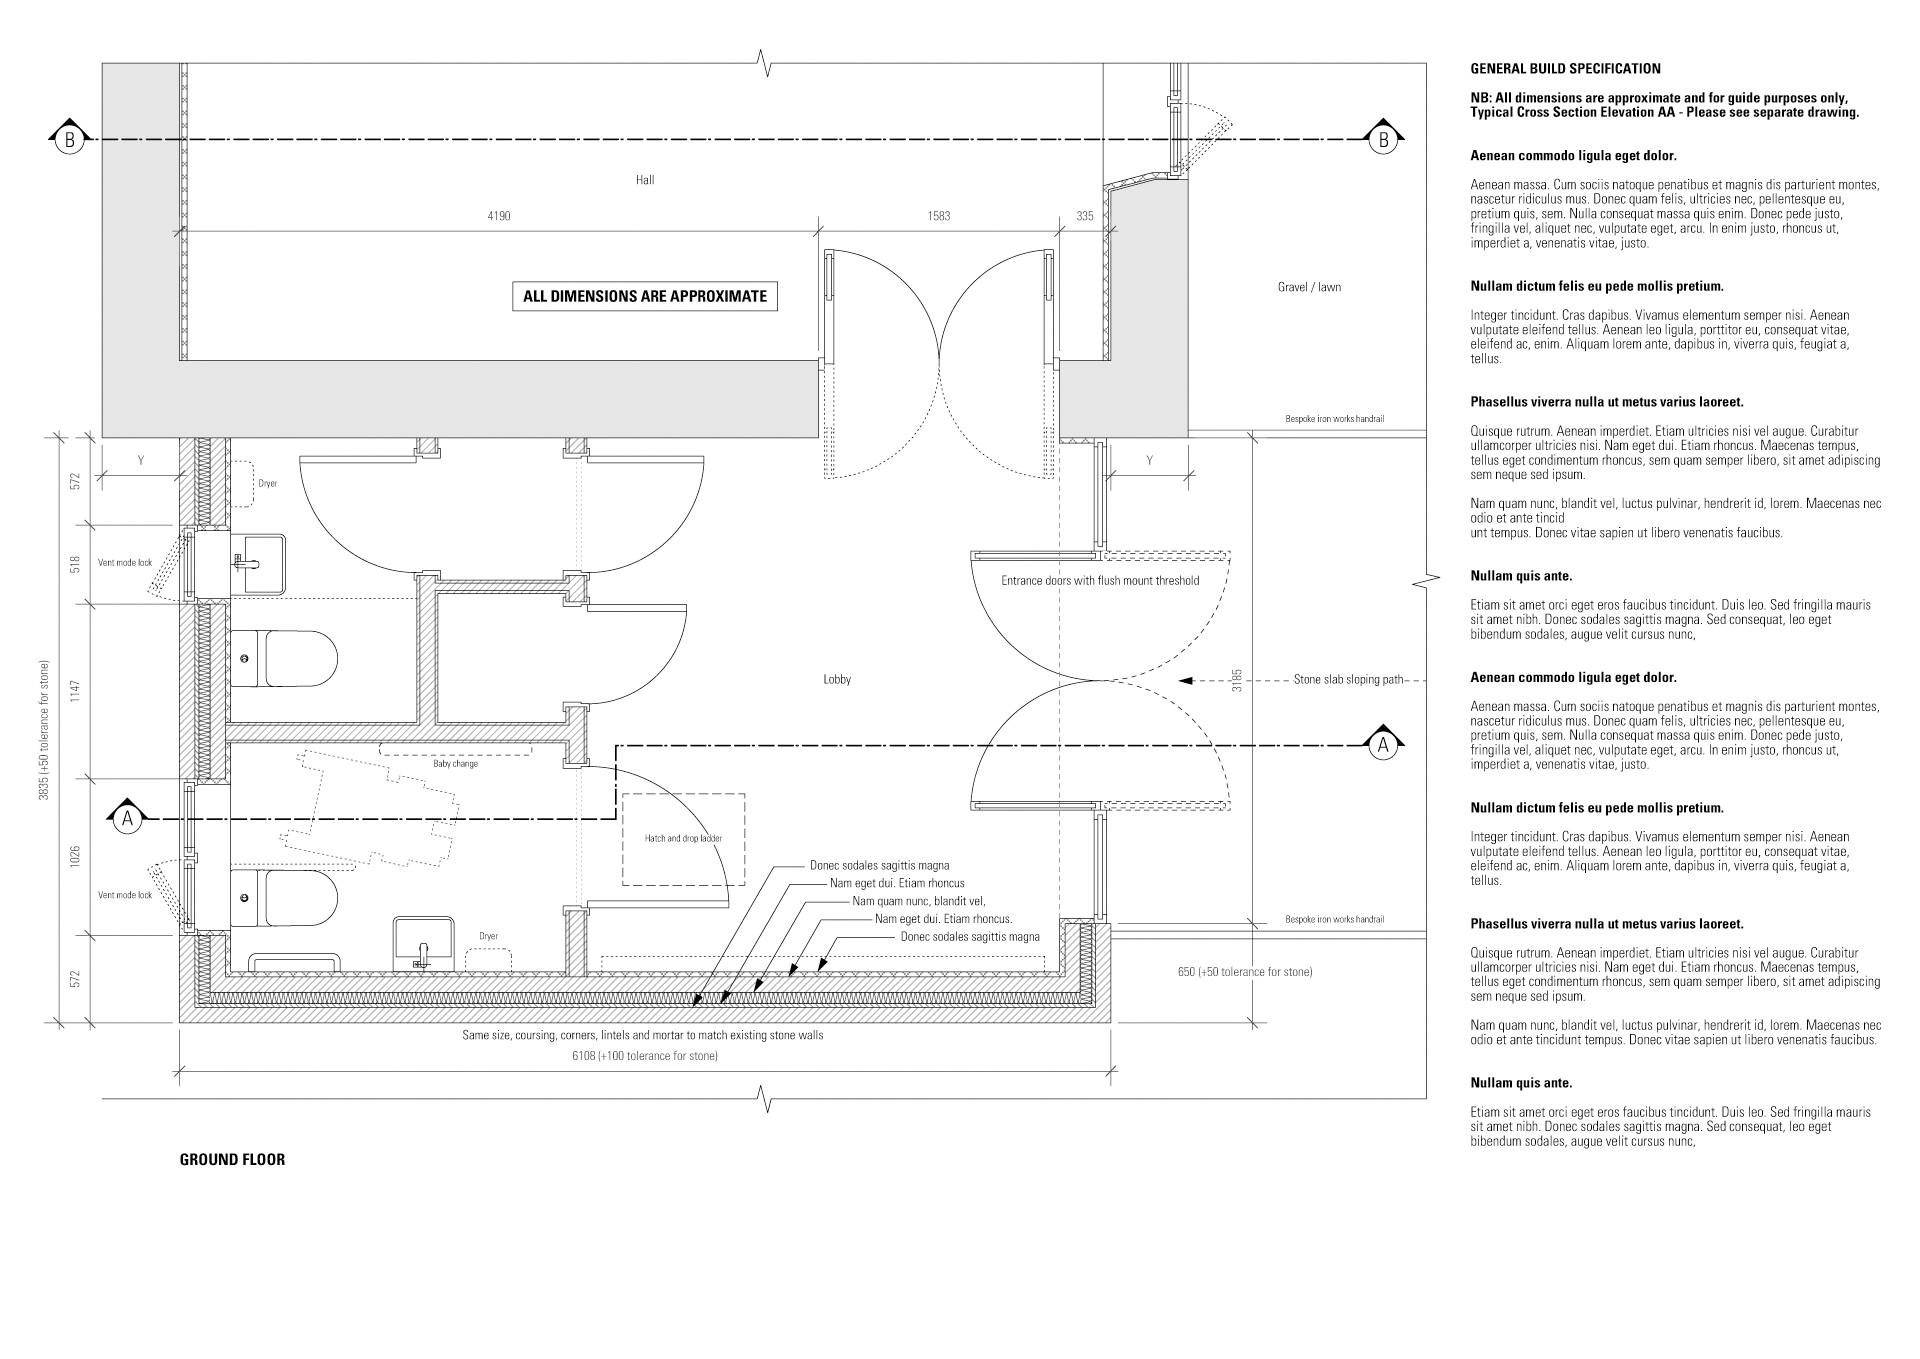 02 228 10C Specification Plan copy.jpg